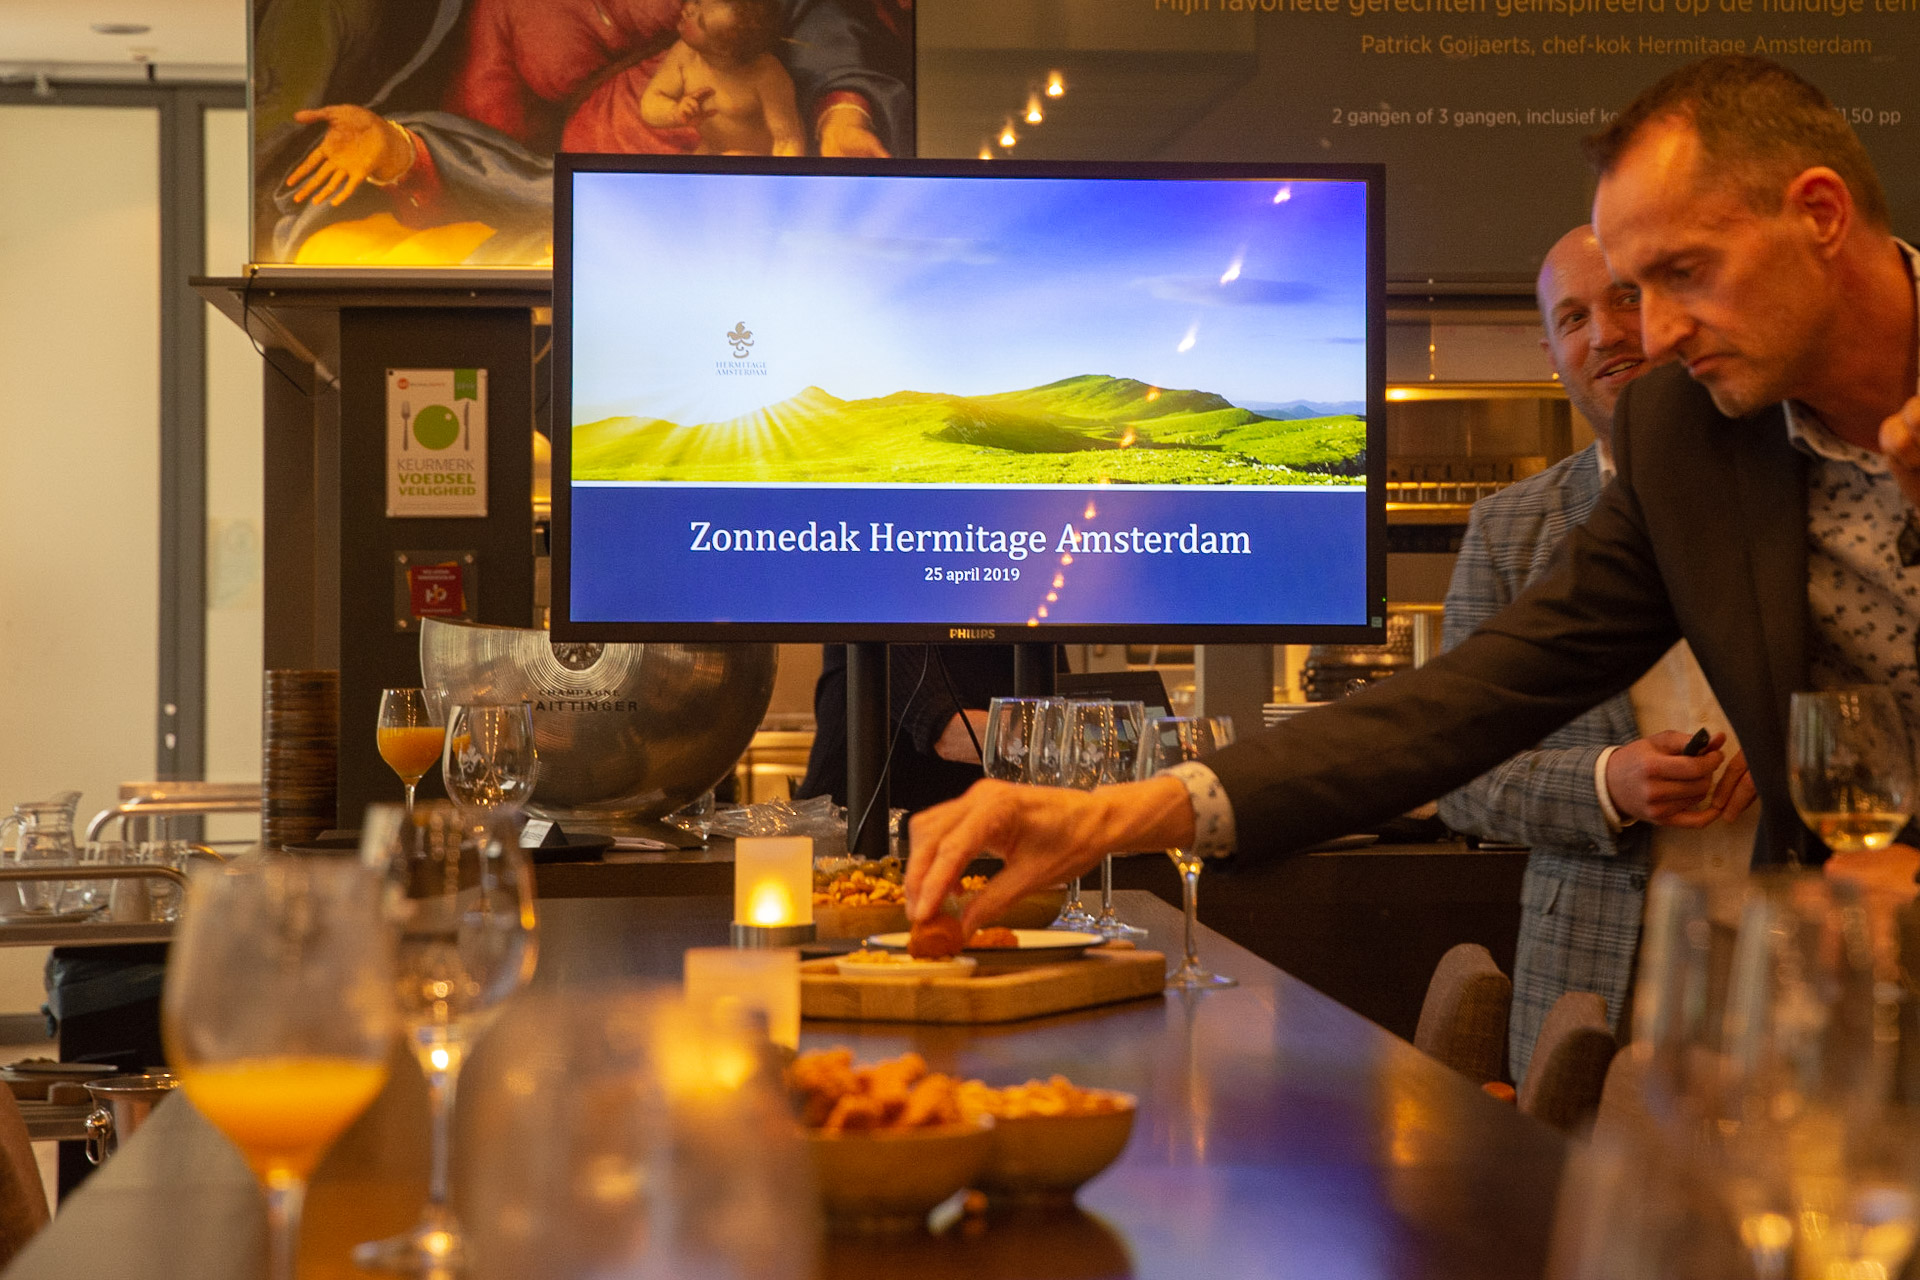 Aanvang presentatie Zonnedak Hermitage Amsterdam